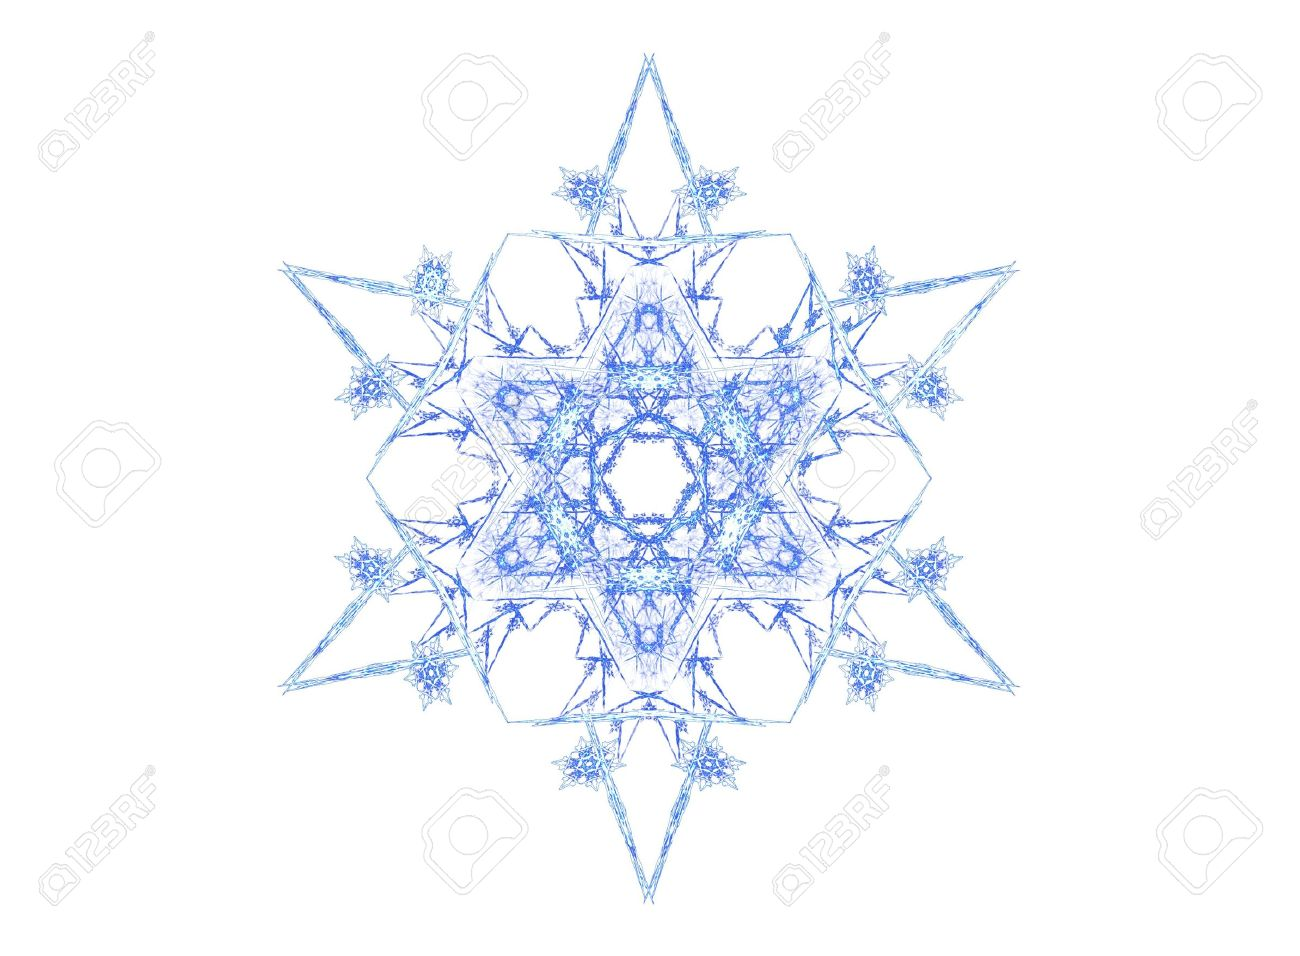 Snowflake by TaffGoch on DeviantArt